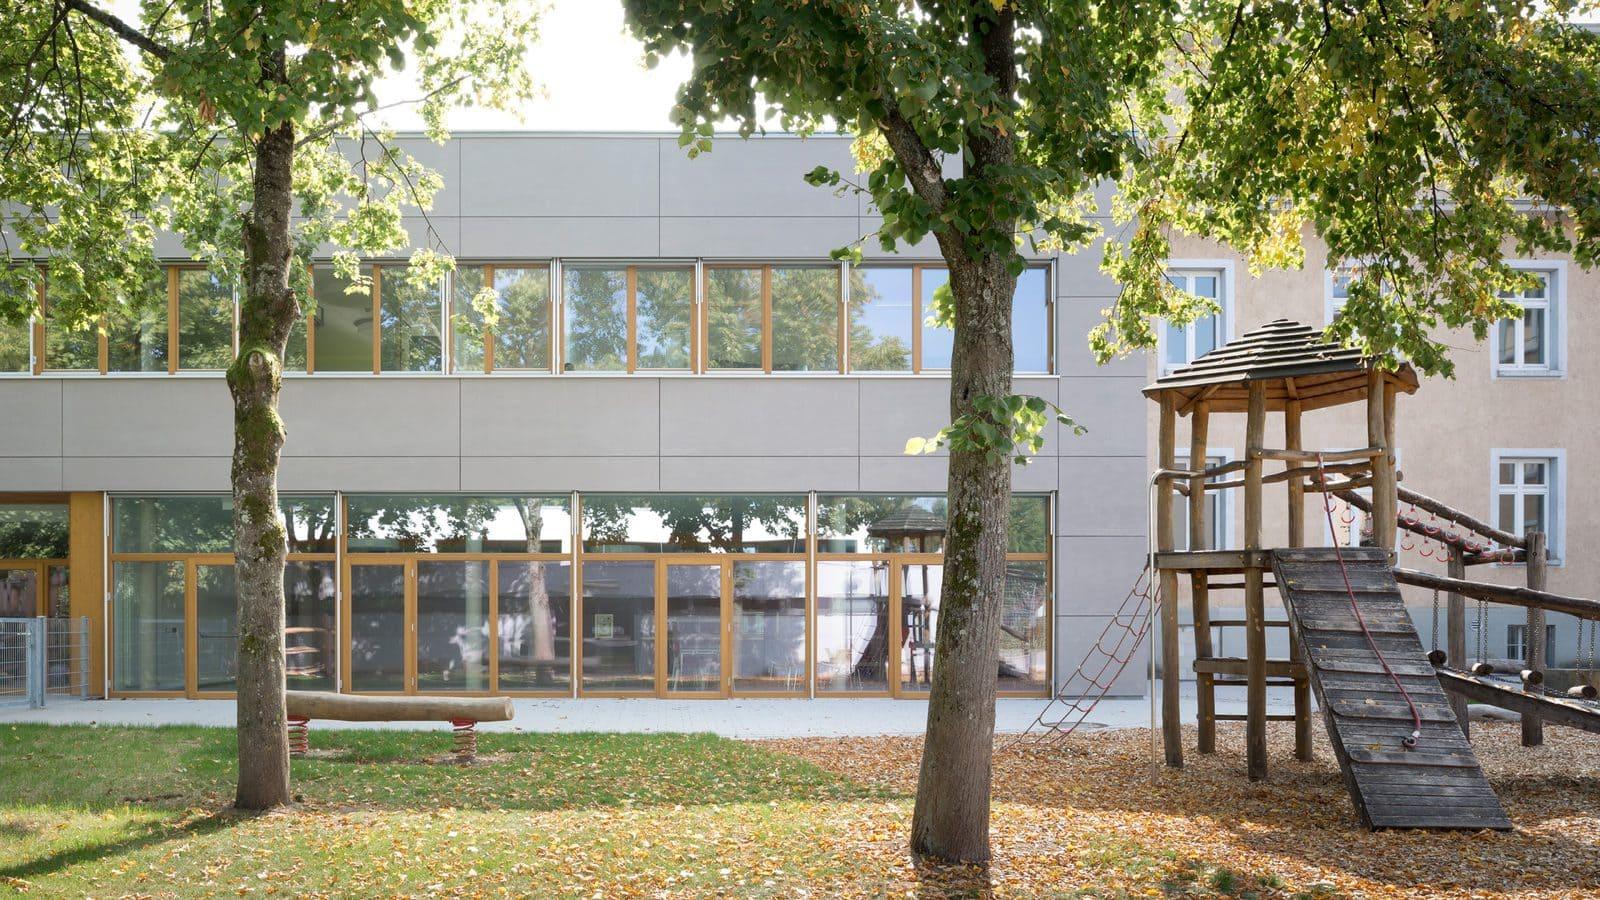 Stocker Dewes Architekten BDA – Kita West, Freiburg im Breisgau